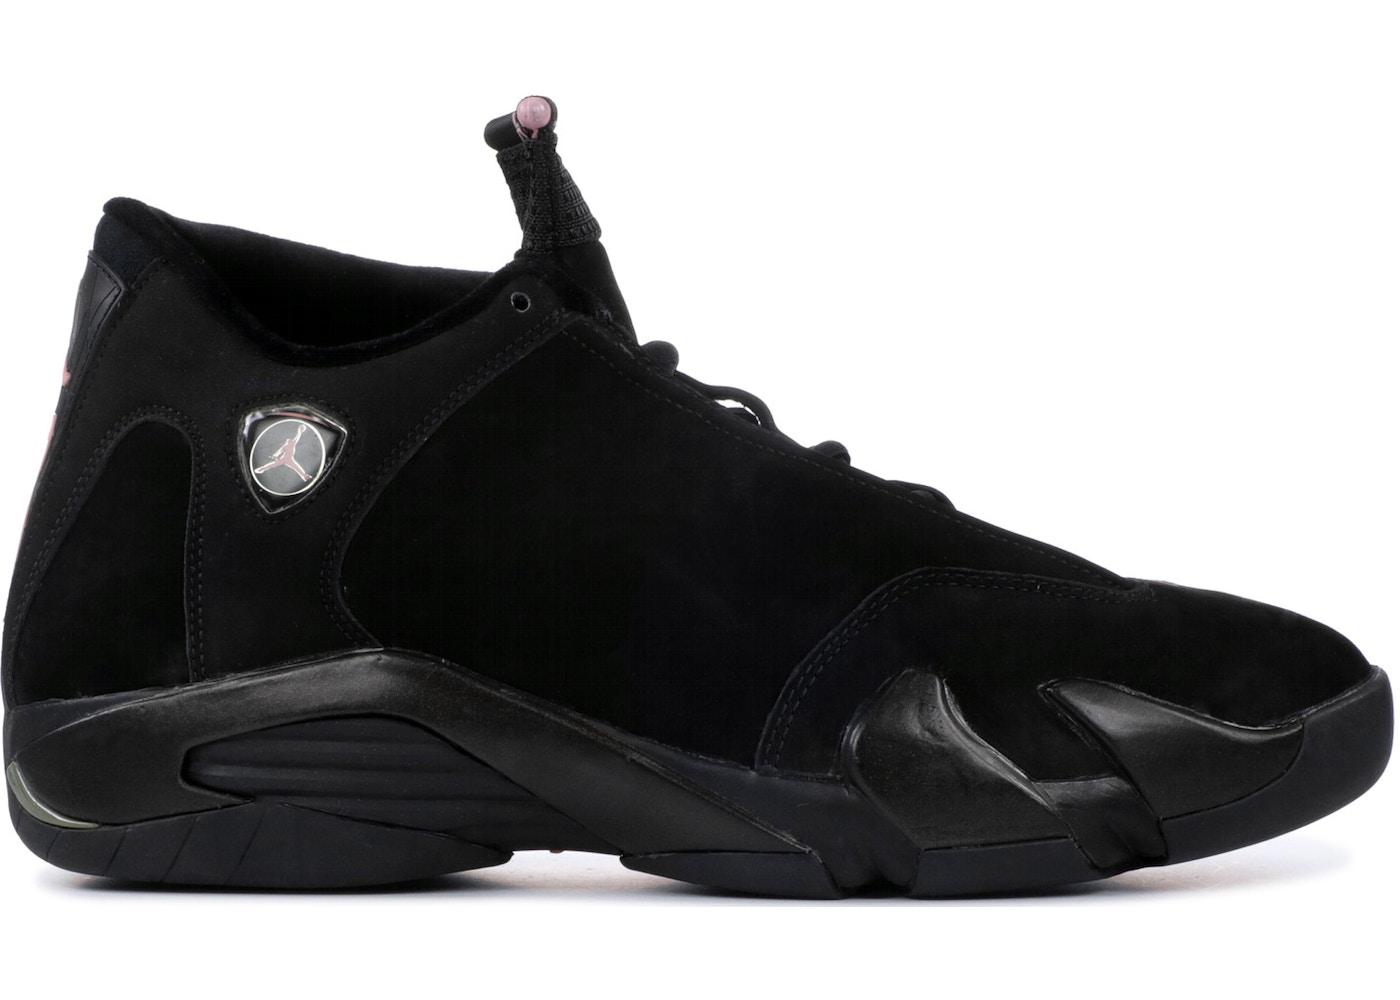 low priced b151e 7d477 Jordan 14 Retro Black Real Pink (W)